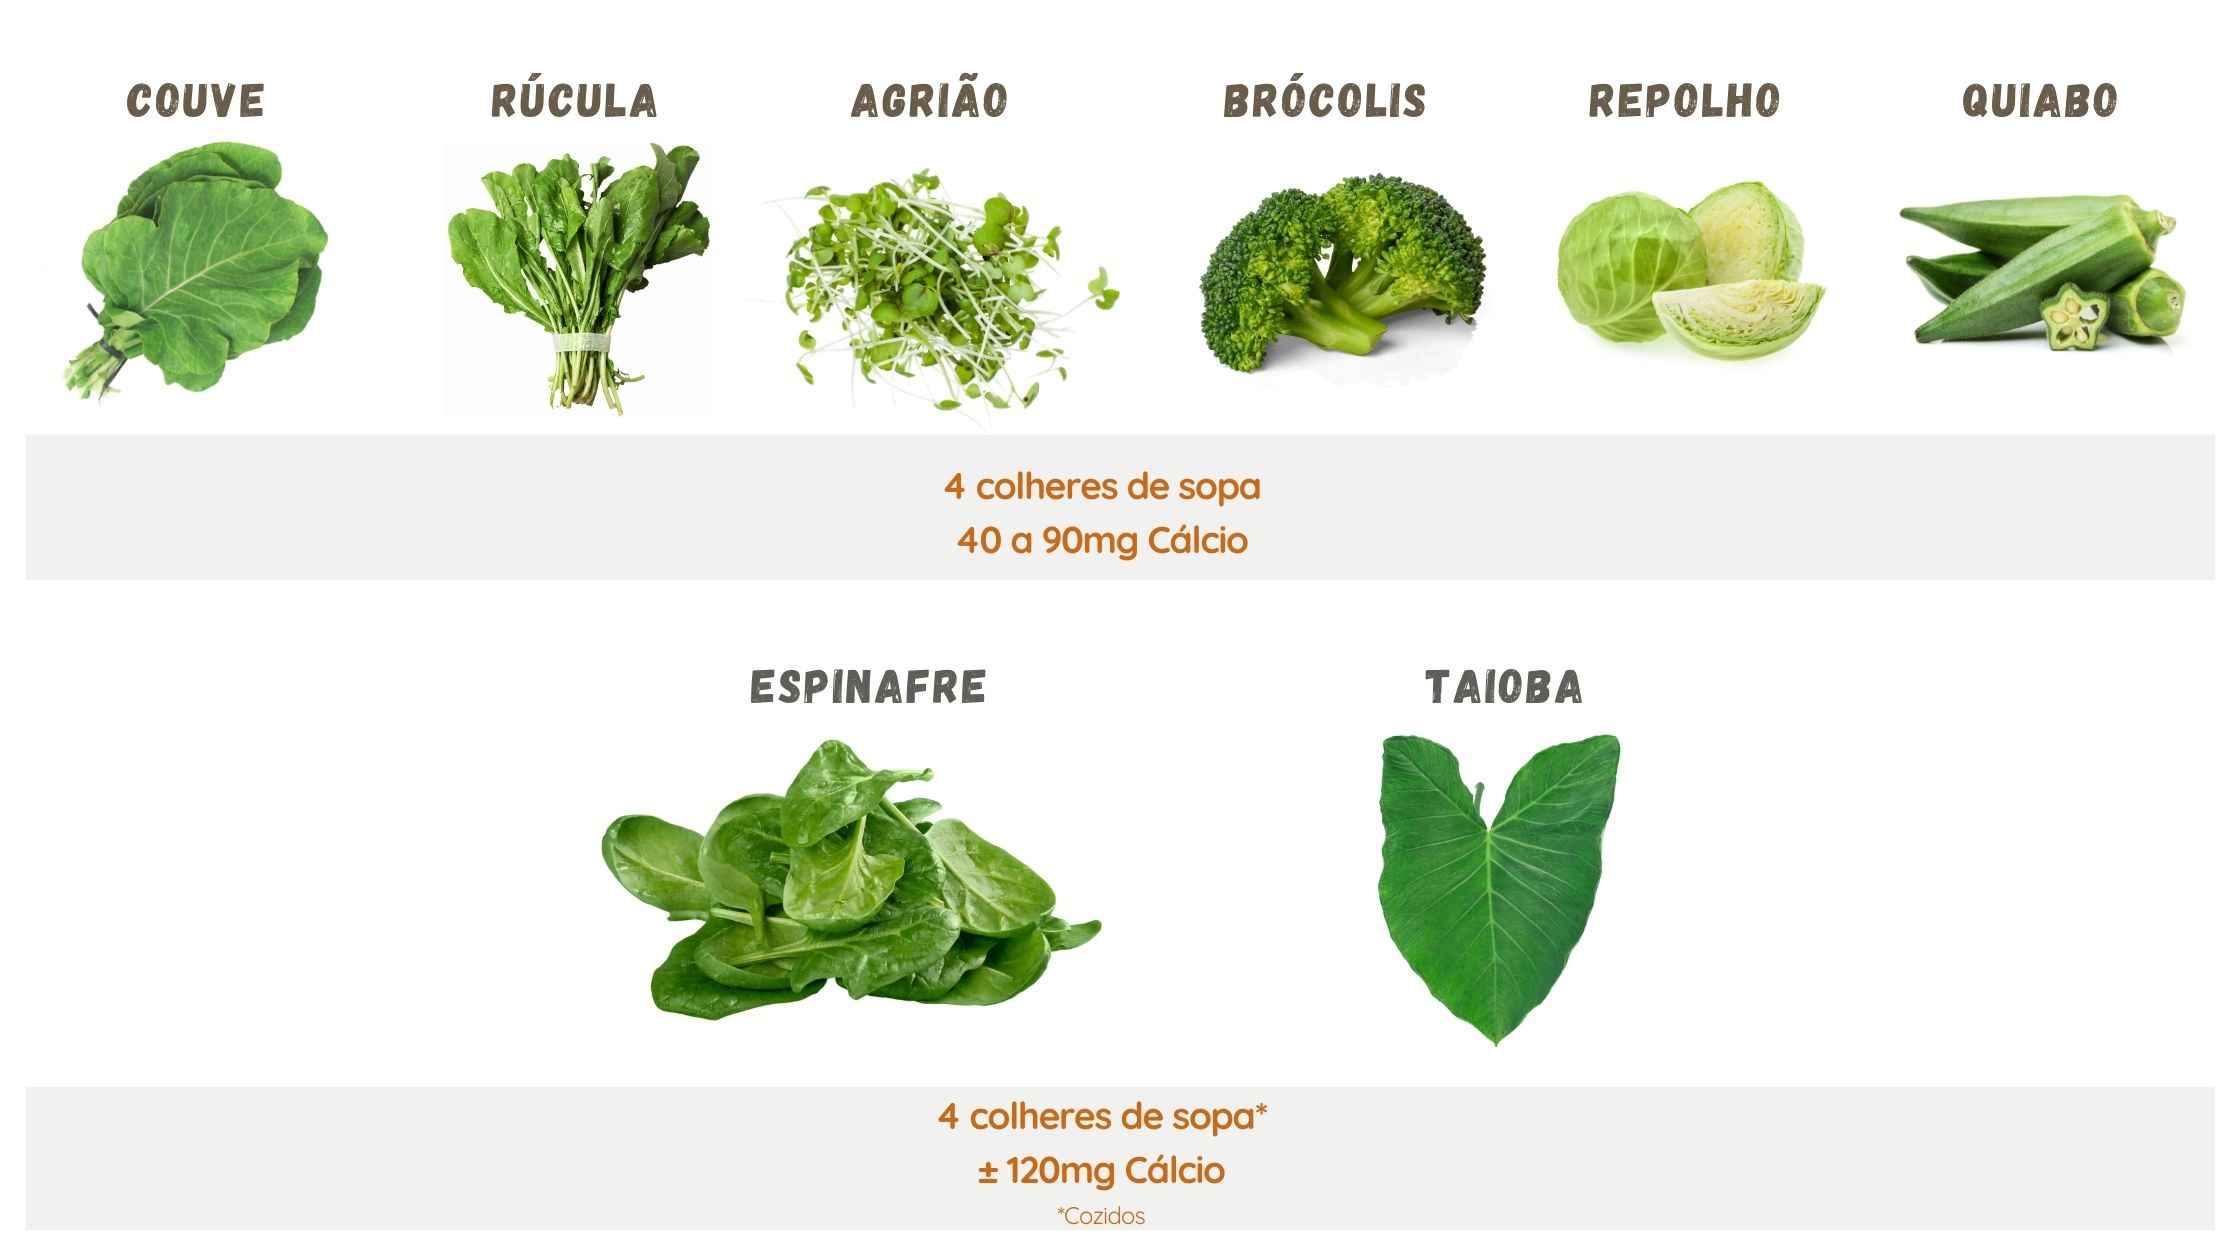 alimentos Vegetais Verdes